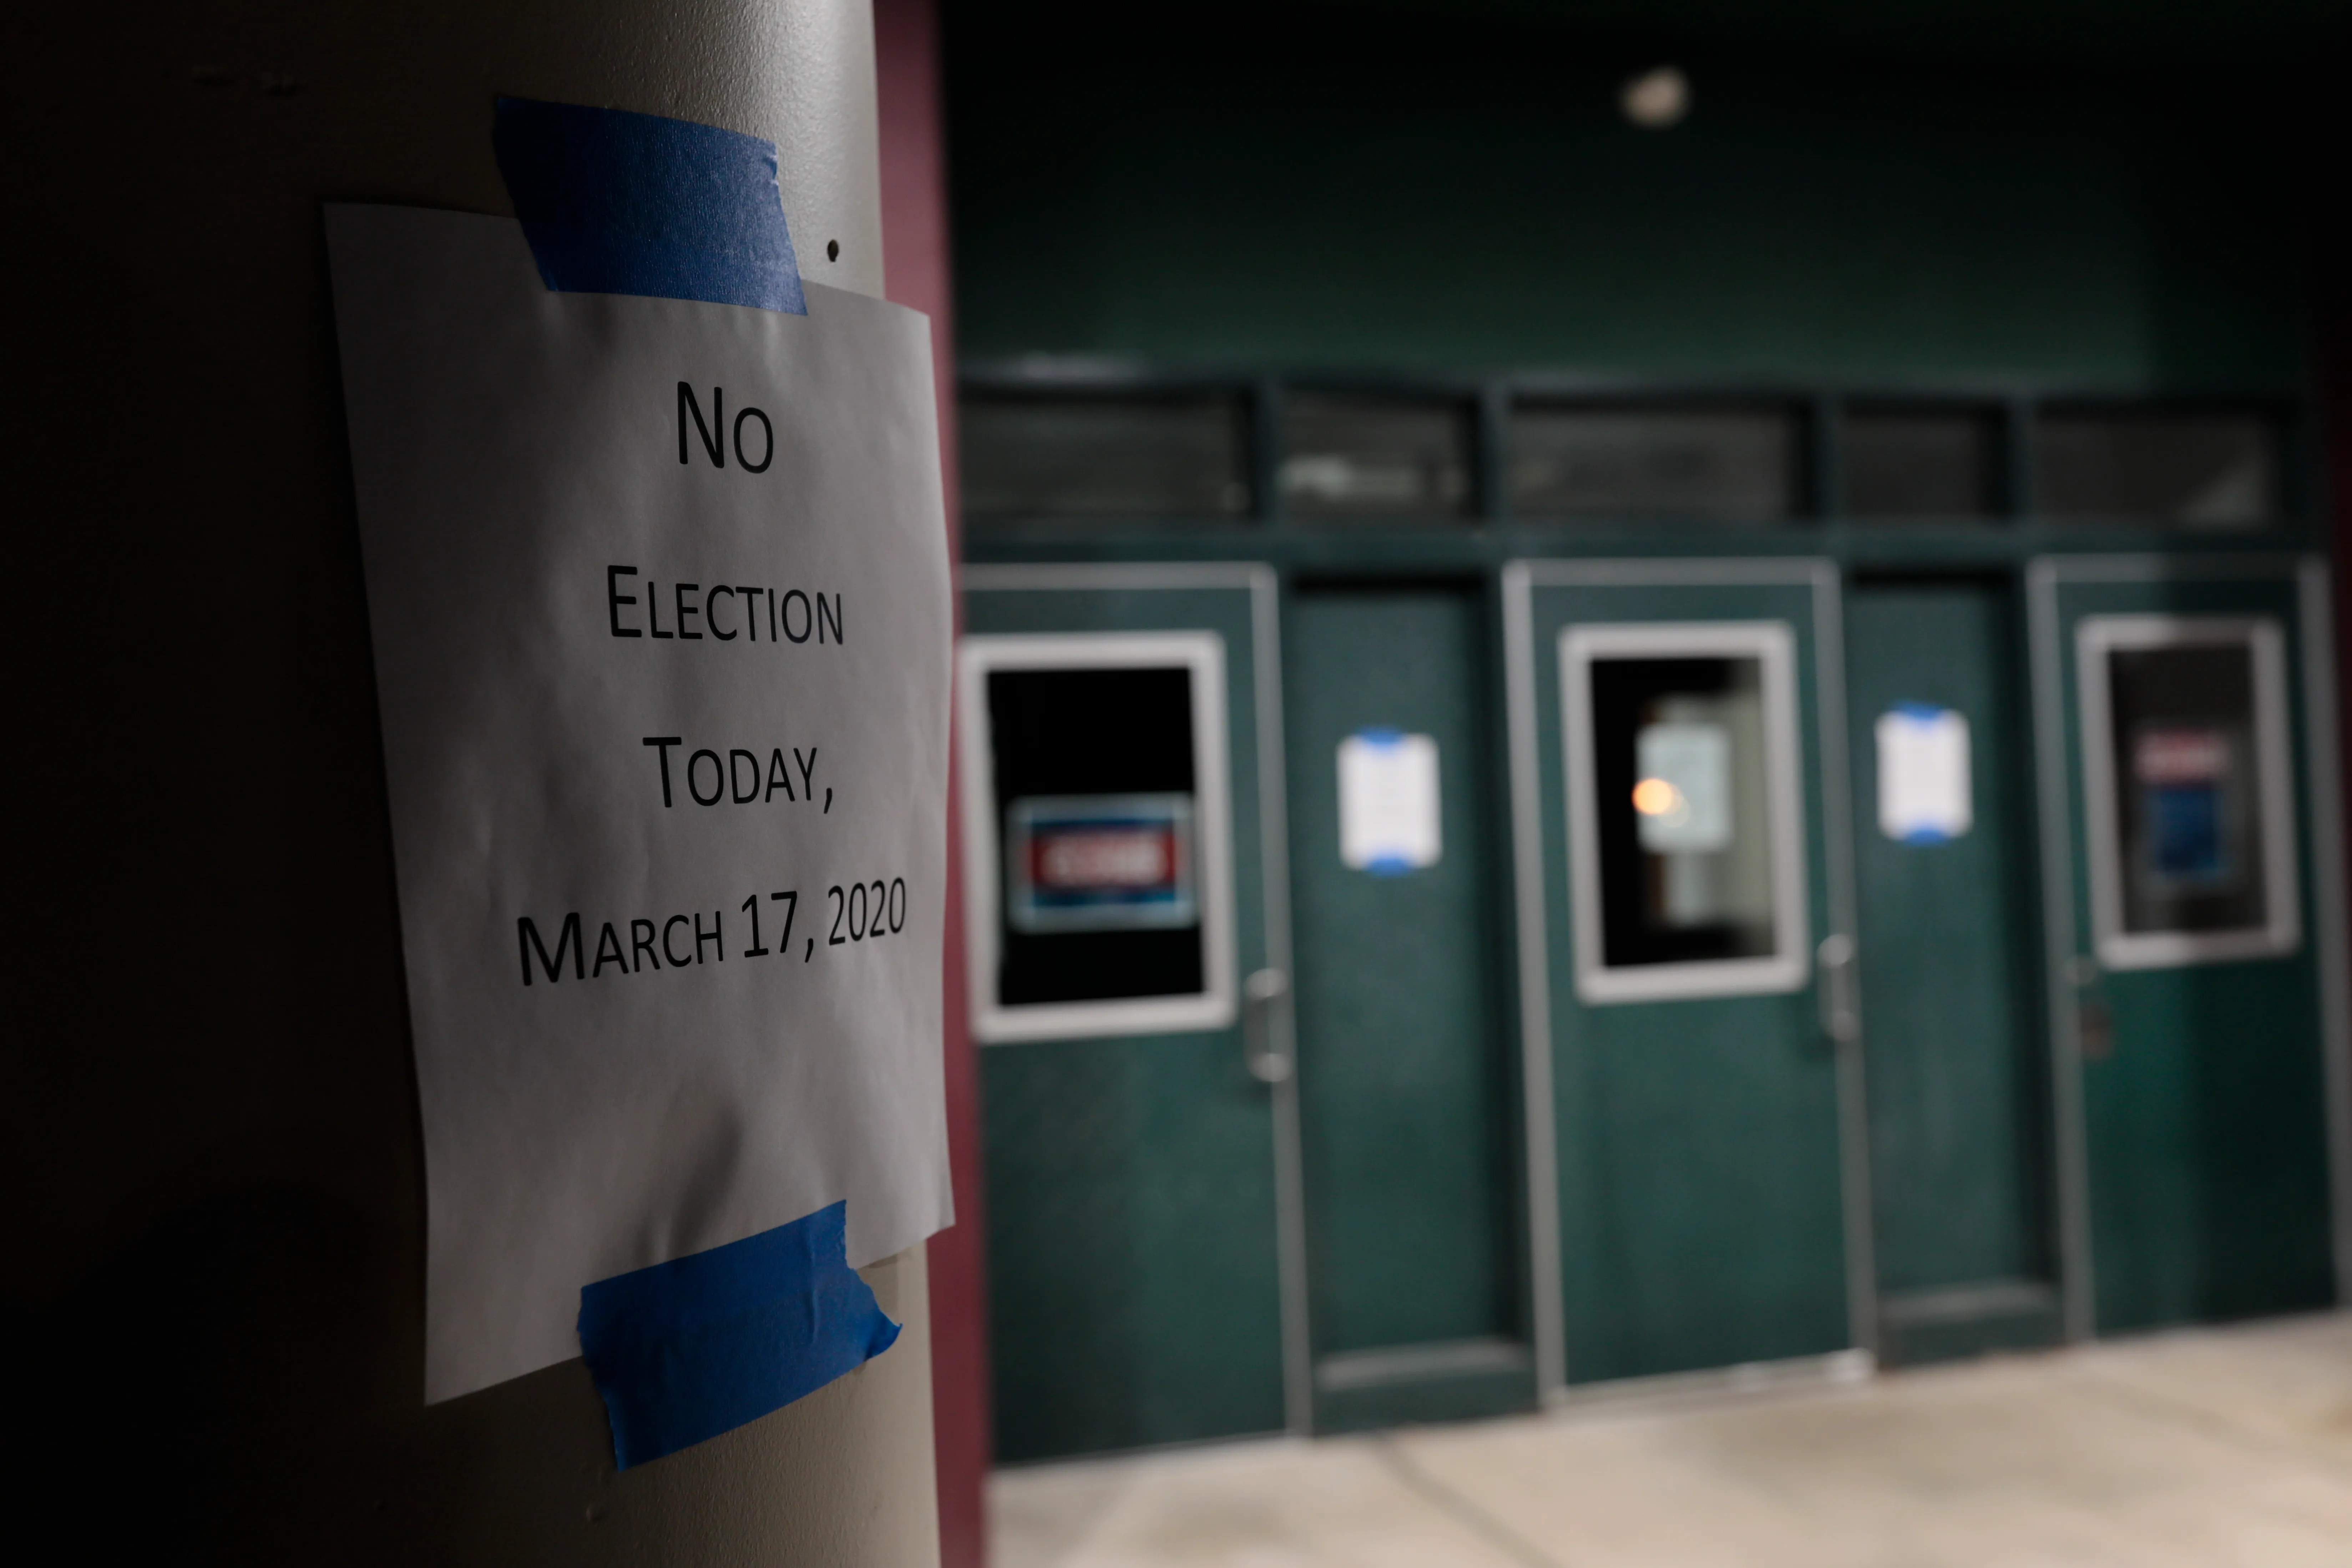 Coronavirus live updates: 114 US deaths; Nevada closes casinos